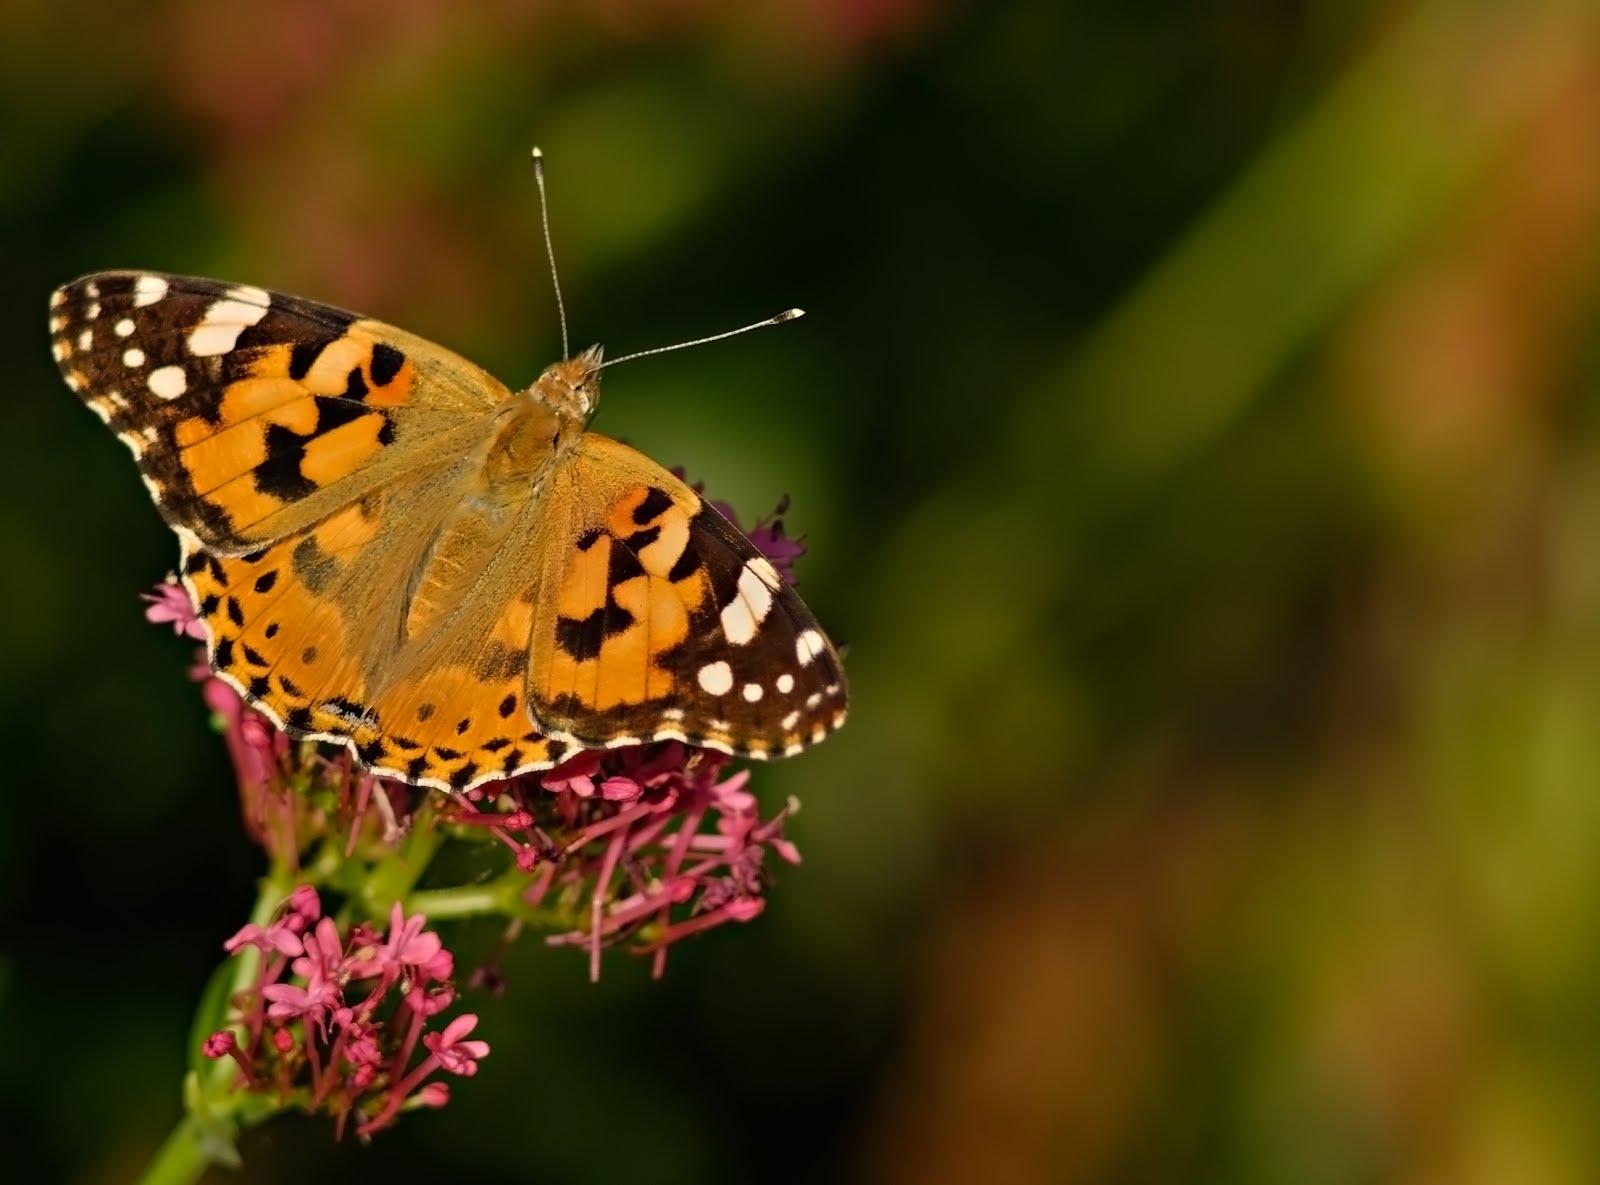 Flores Hermosas Flores Silvestres Fondos De Pantalla Gratis: Fotos De Flores Silvestres Gratis